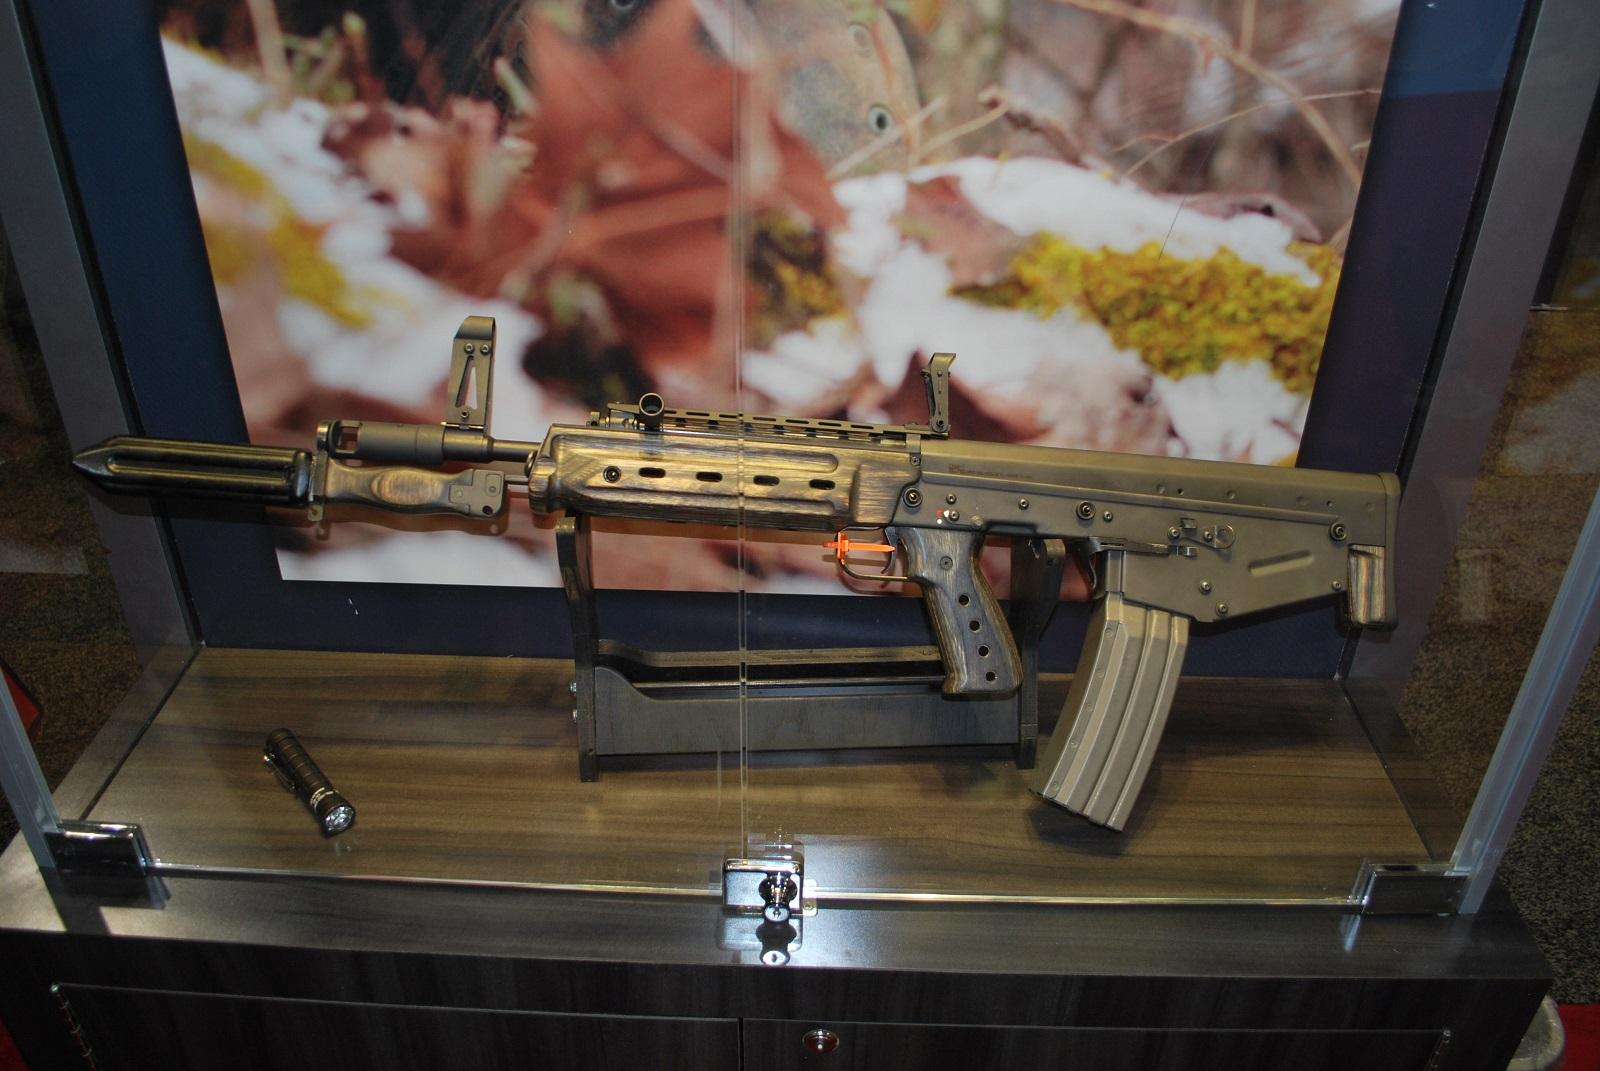 Kel-Tec Showcases New RDB and M43 Bullpup Rifles at SHOT Show